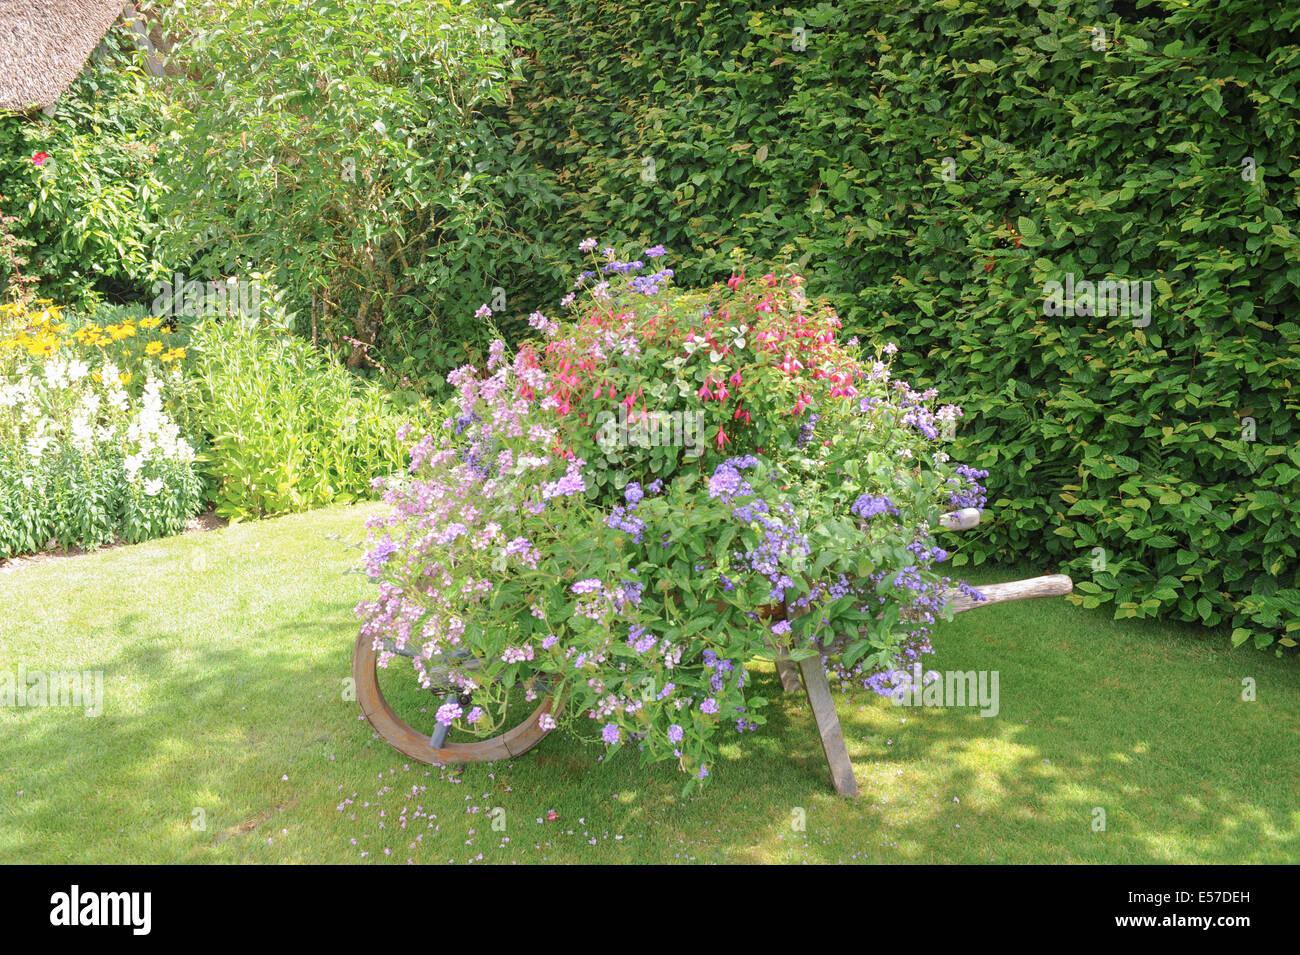 fuchsia hedge stockfotos fuchsia hedge bilder alamy. Black Bedroom Furniture Sets. Home Design Ideas